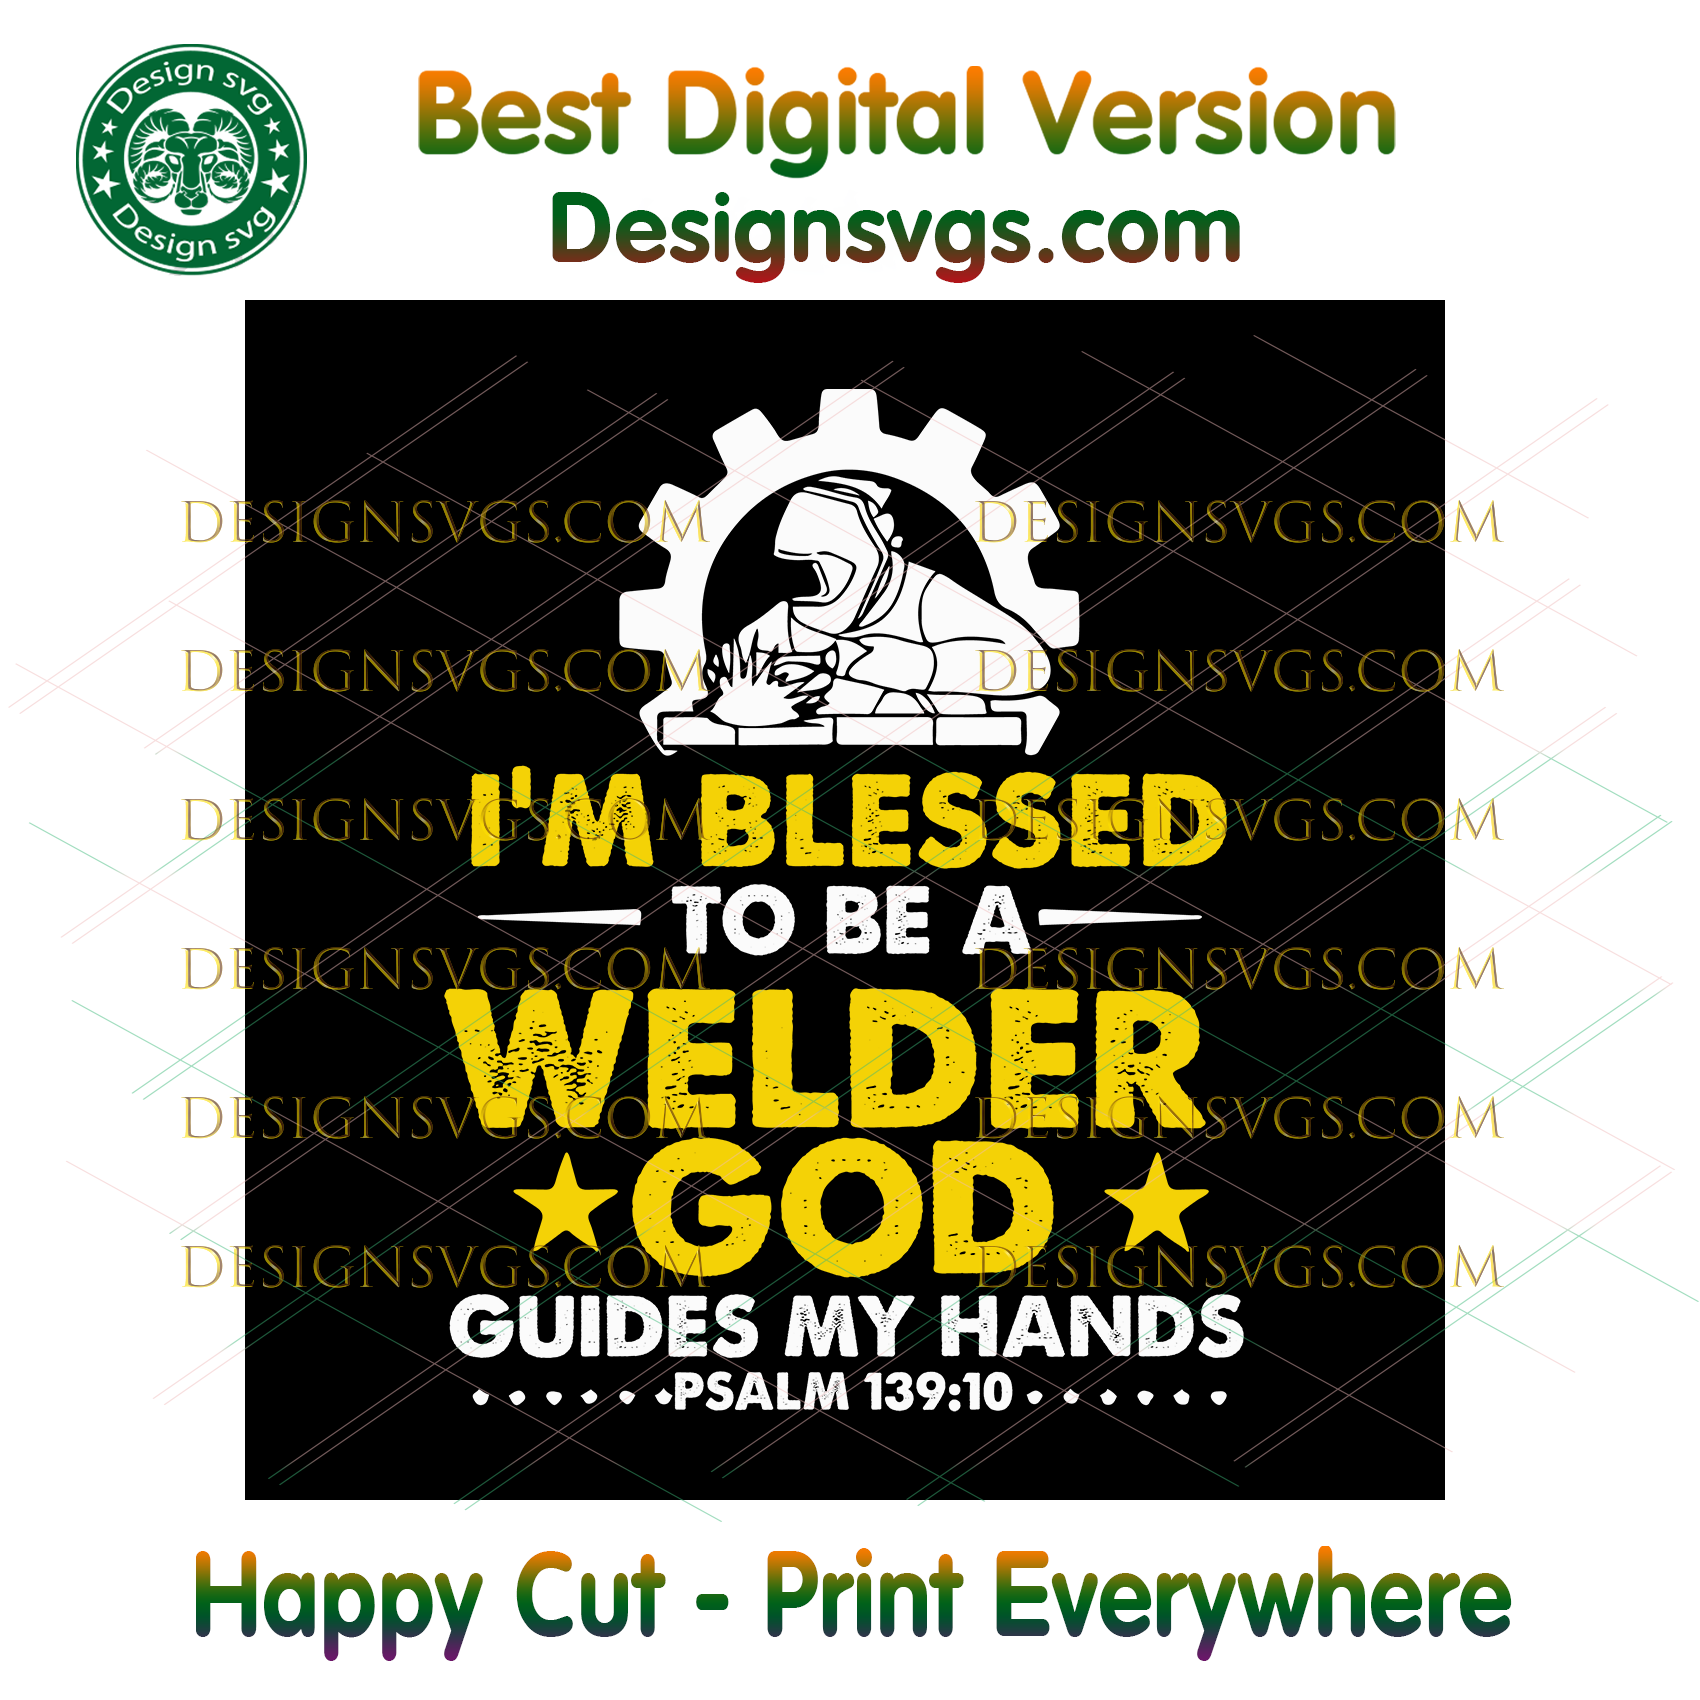 Im Blessed To Be A Welder God Guides My Hands Svg, Trending Svg, Welder Gift